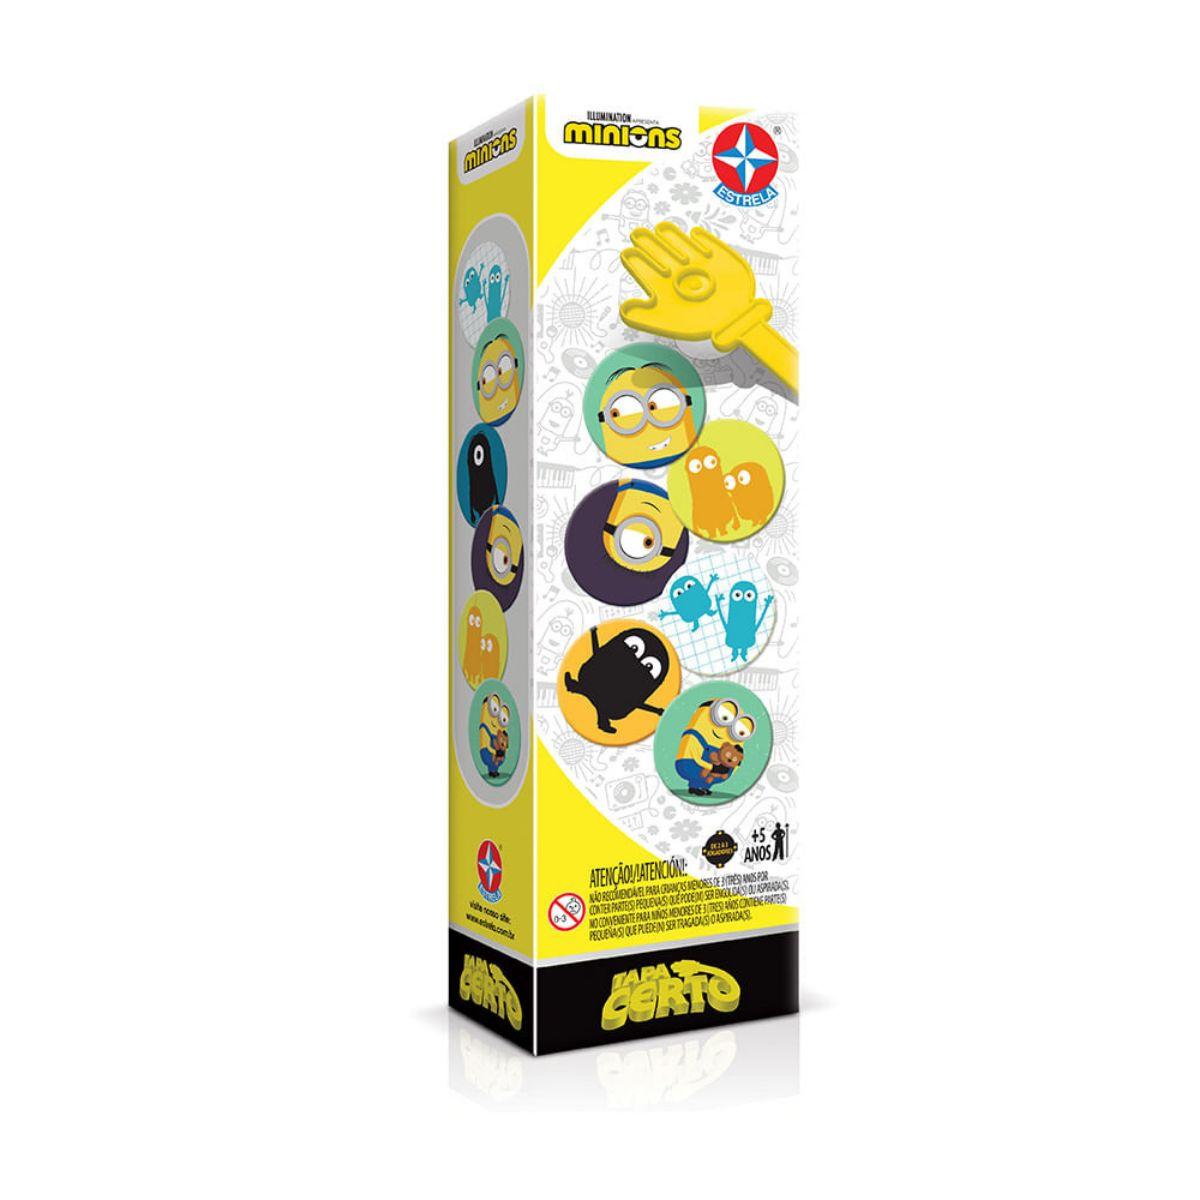 Jogo Tapa Certo de Cartas Minions Super divertido - Estrela